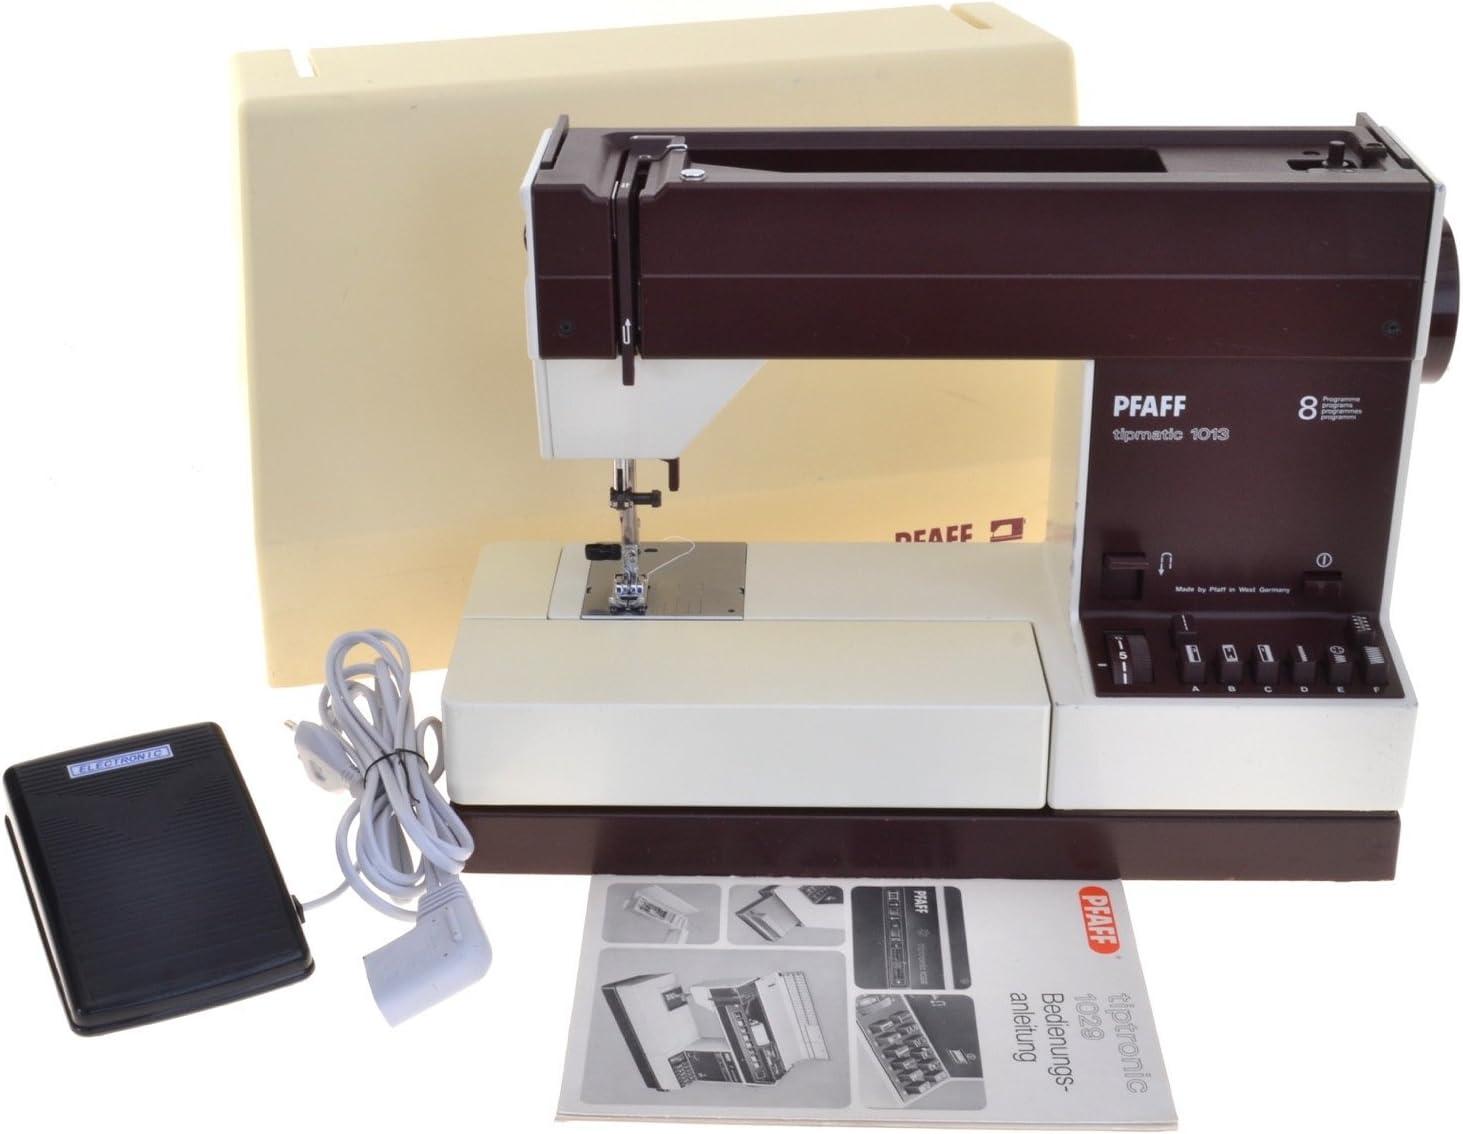 Máquina de coser Pfaff tipm Atic 1013: Amazon.es: Hogar